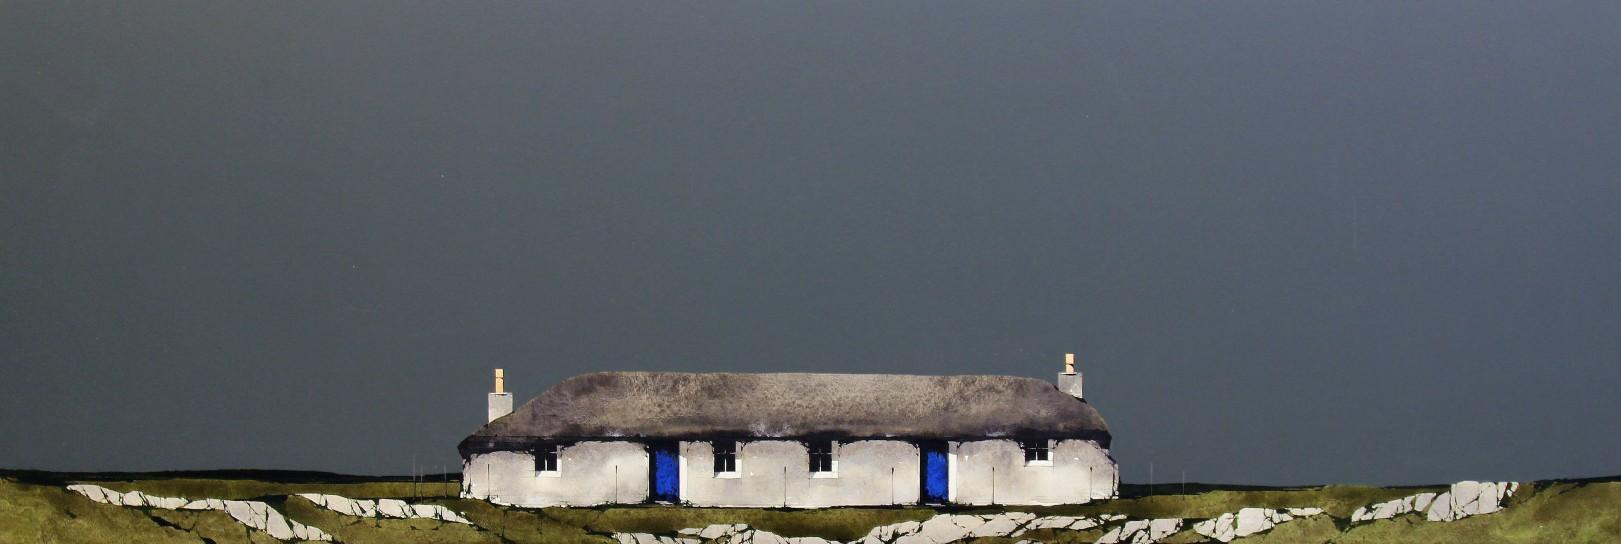 Ron Lawson_Sheila's Cottage, Ulva_Watercolour & Gouache_EAS575_13.5x38.5_VI